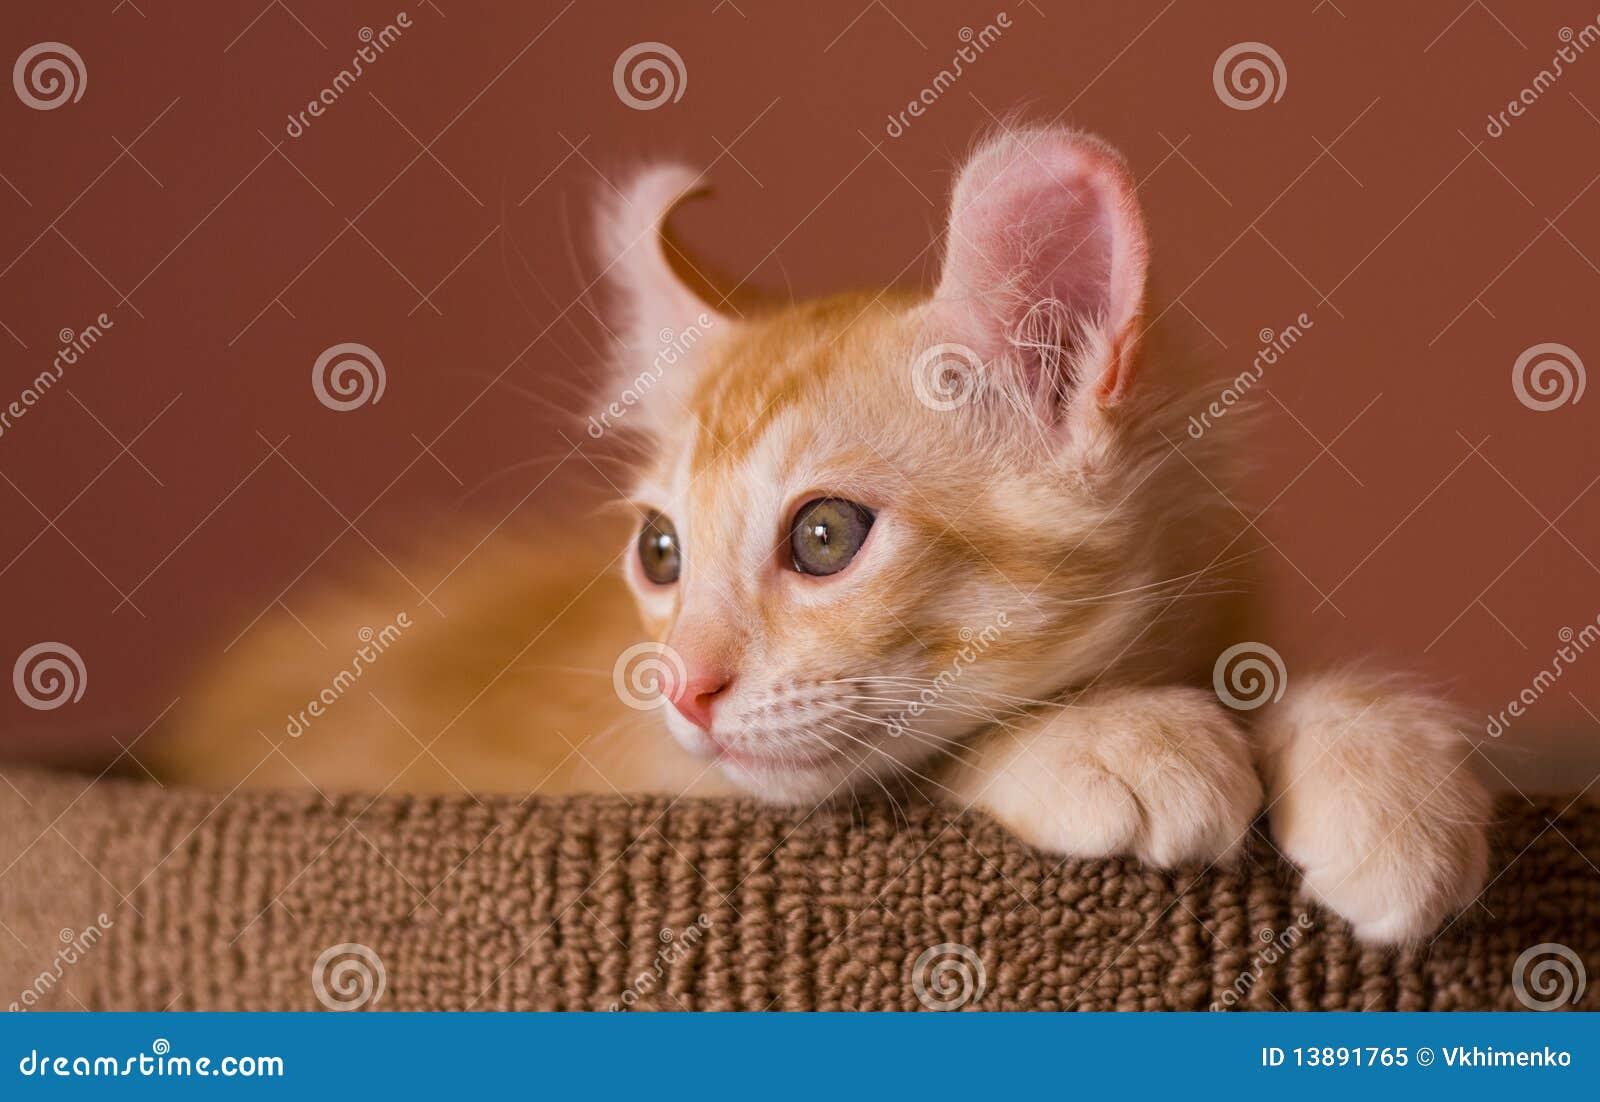 American Curl Cat Cost